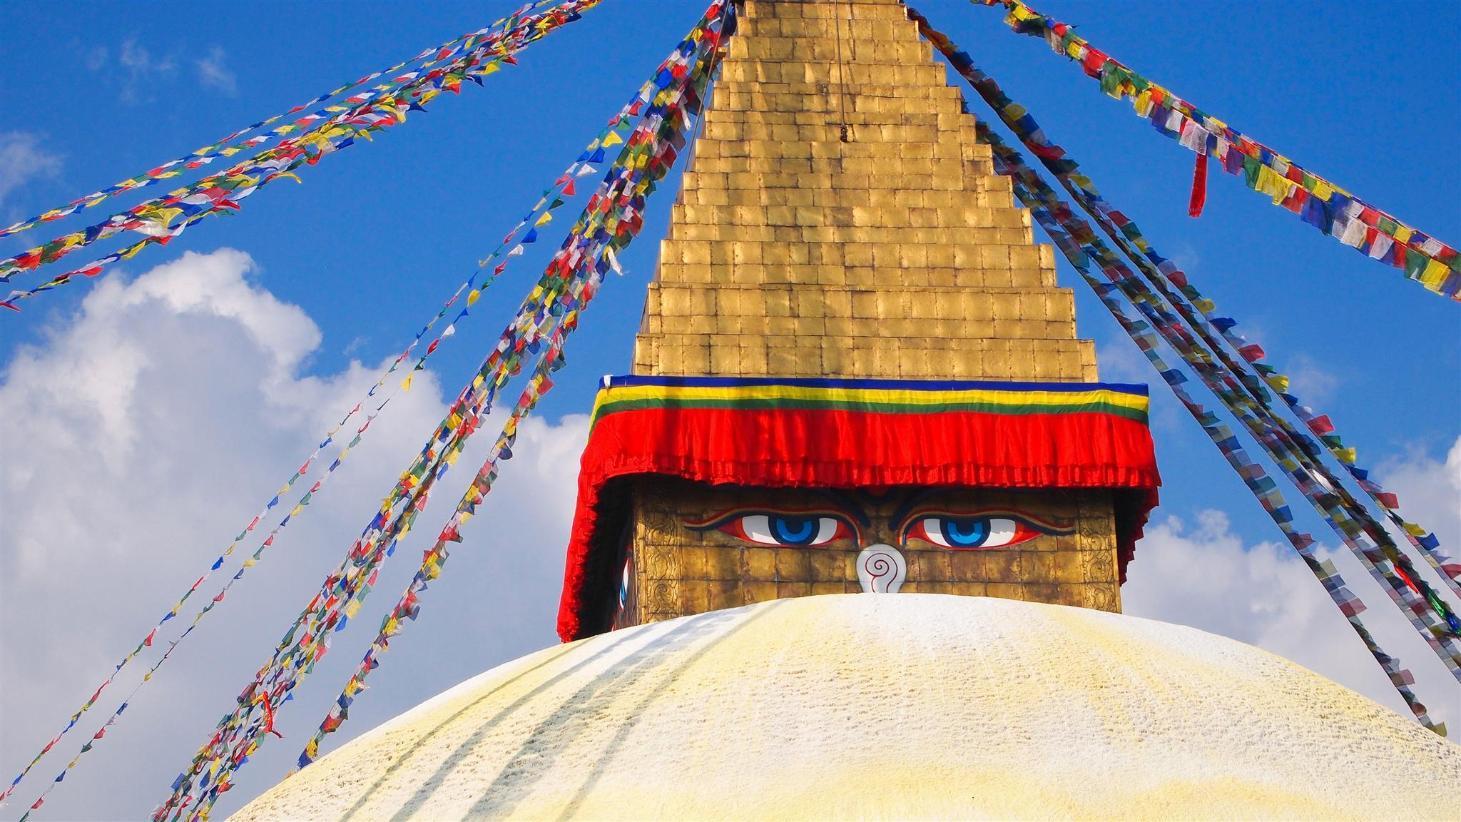 10 Best Kathmandu Hotels: HD Photos + Reviews of Hotels in